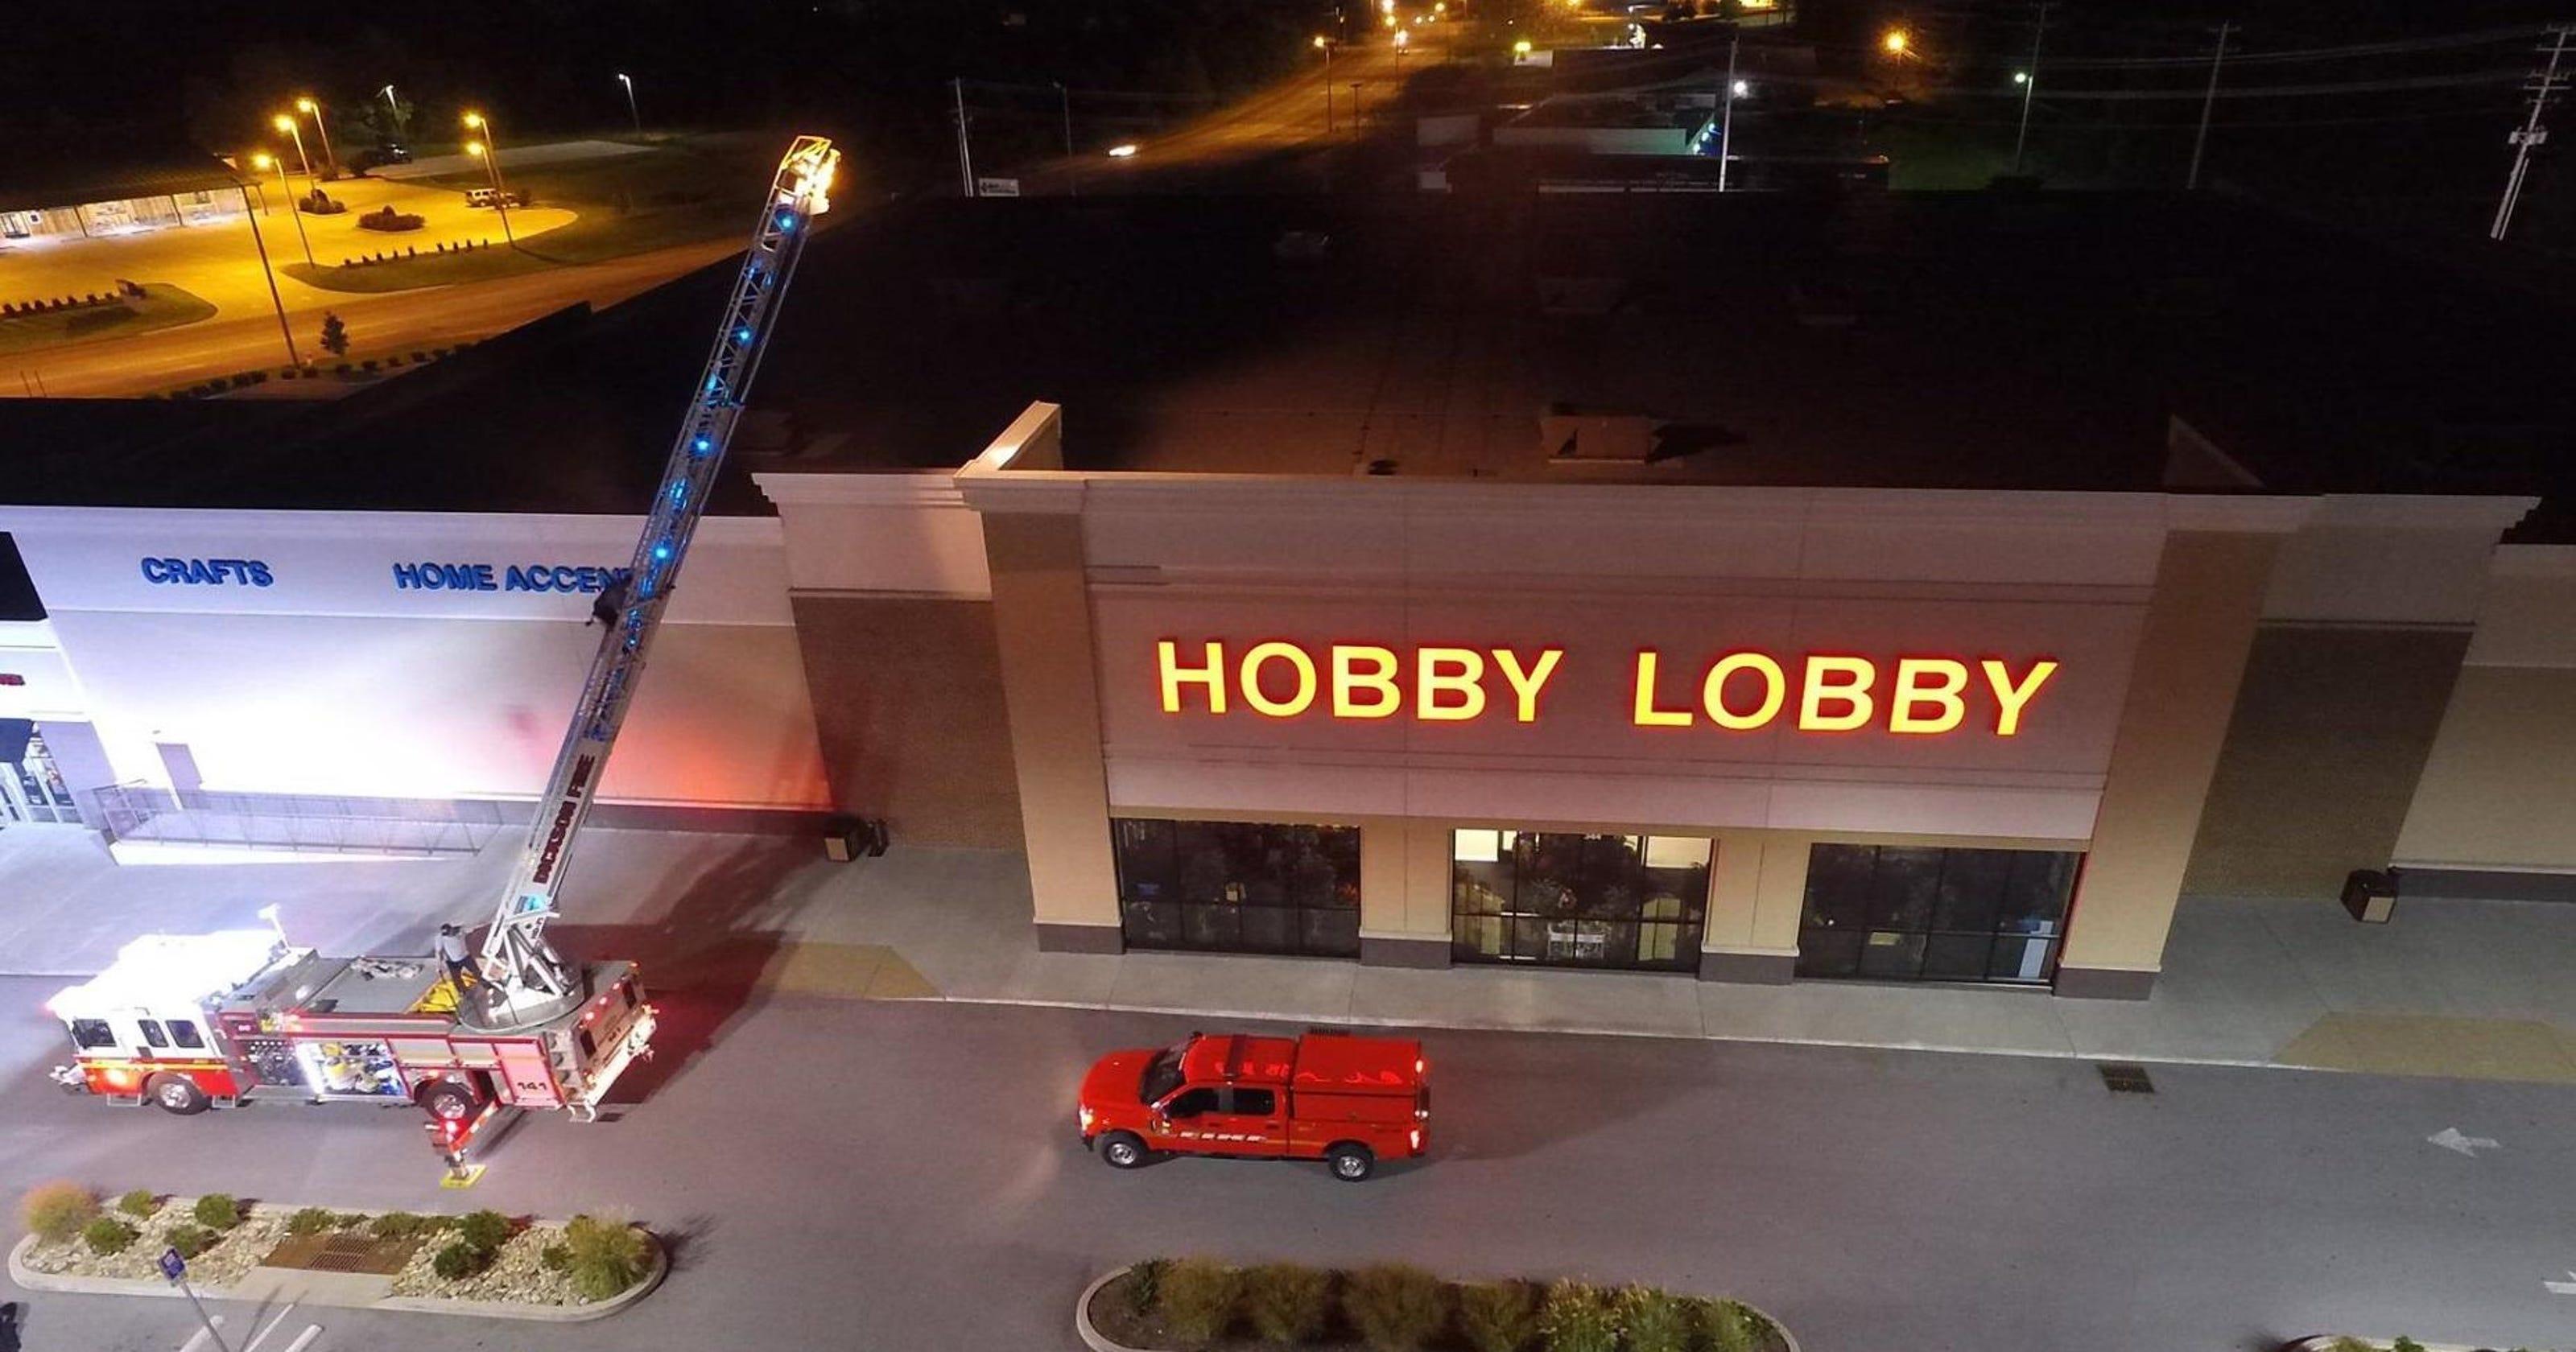 Dickson Hobby Lobby rooftop skateboarder arrested